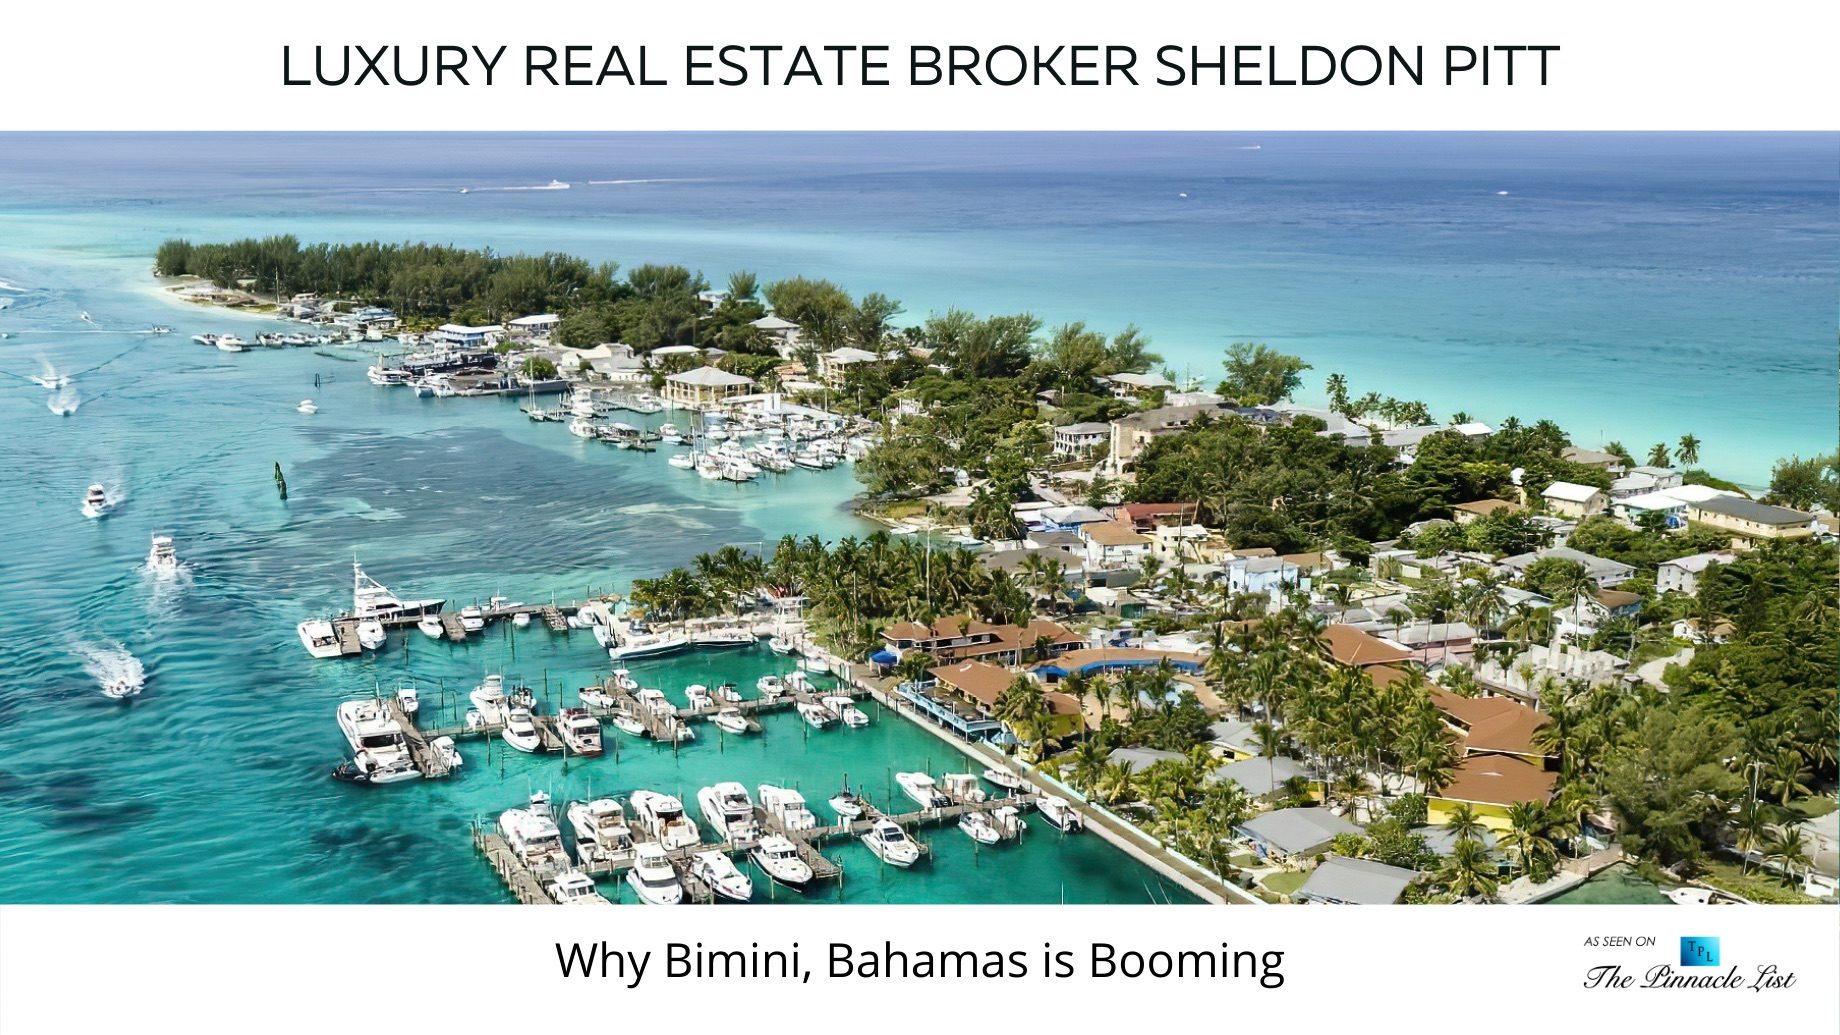 Luxury Real Estate Broker, Sheldon Pitt, Shares Why Bimini, Bahamas is Booming